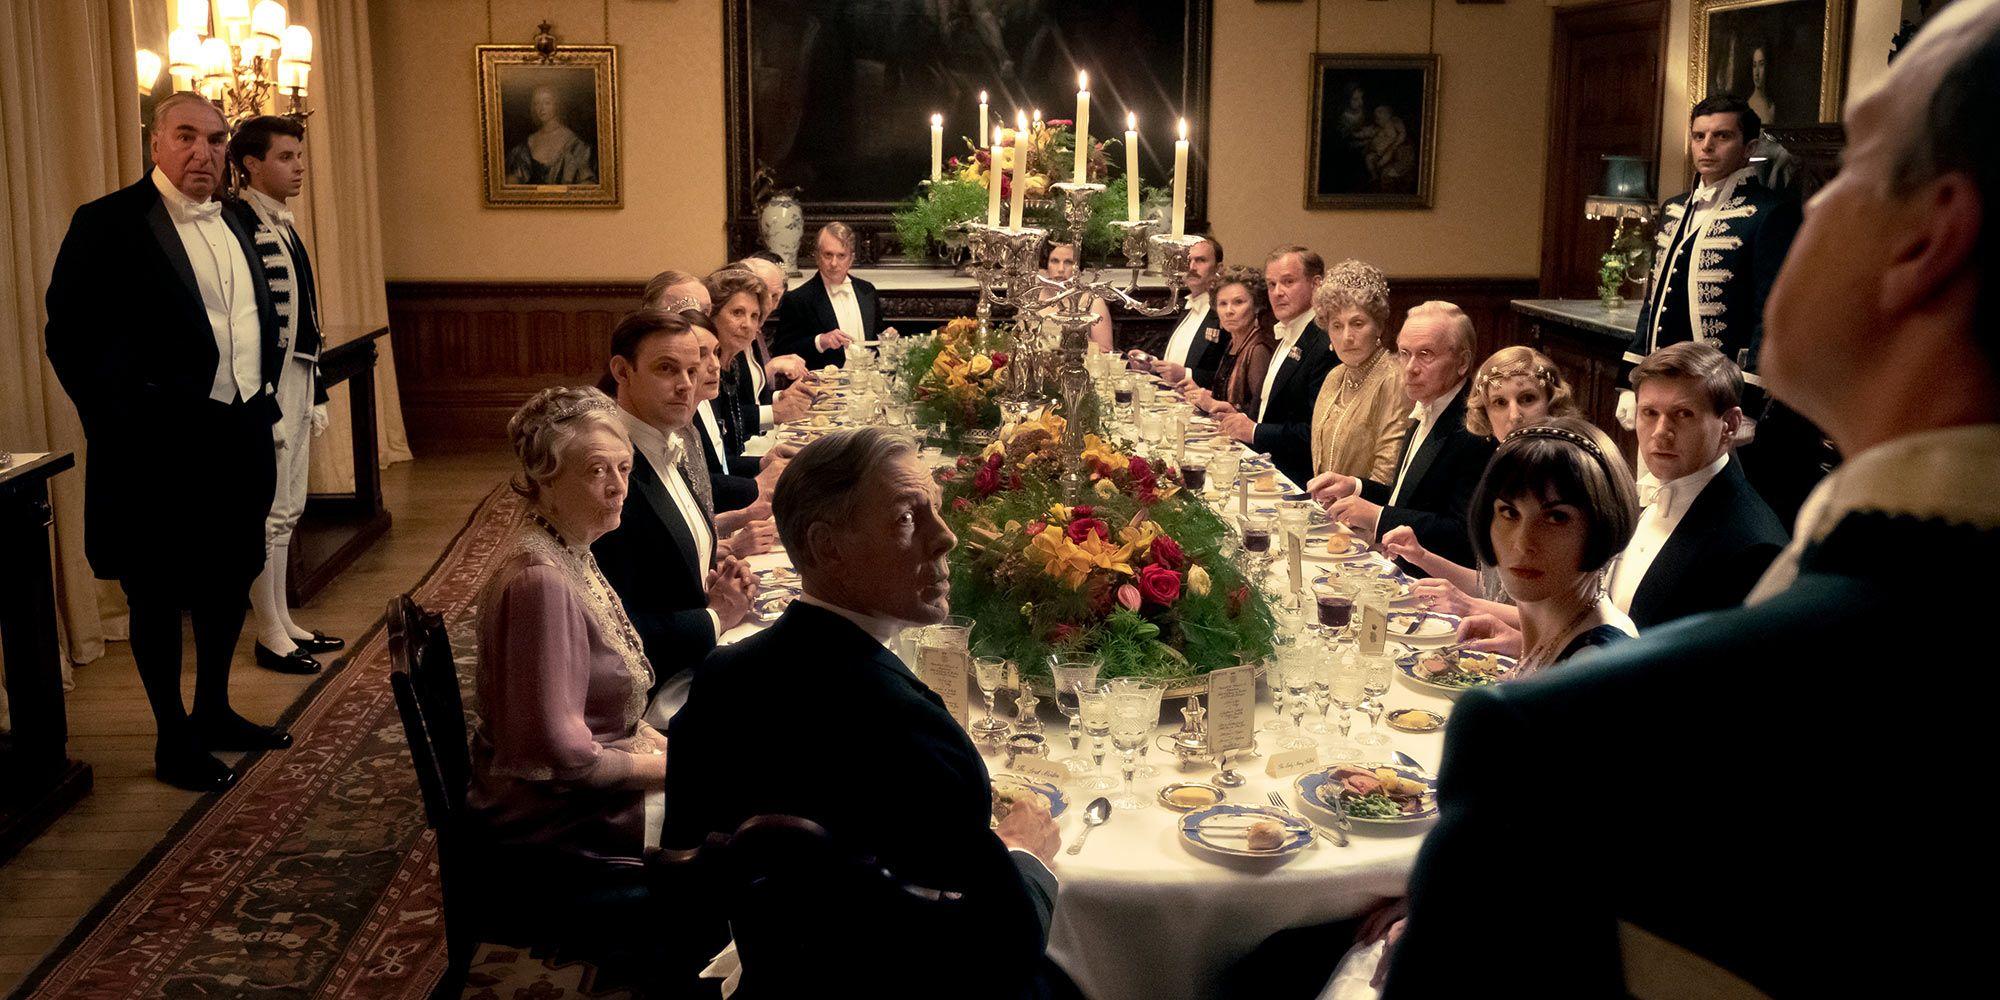 'Downton Abbey' supera a 'Rambo' y 'Ad Astra' en taquilla